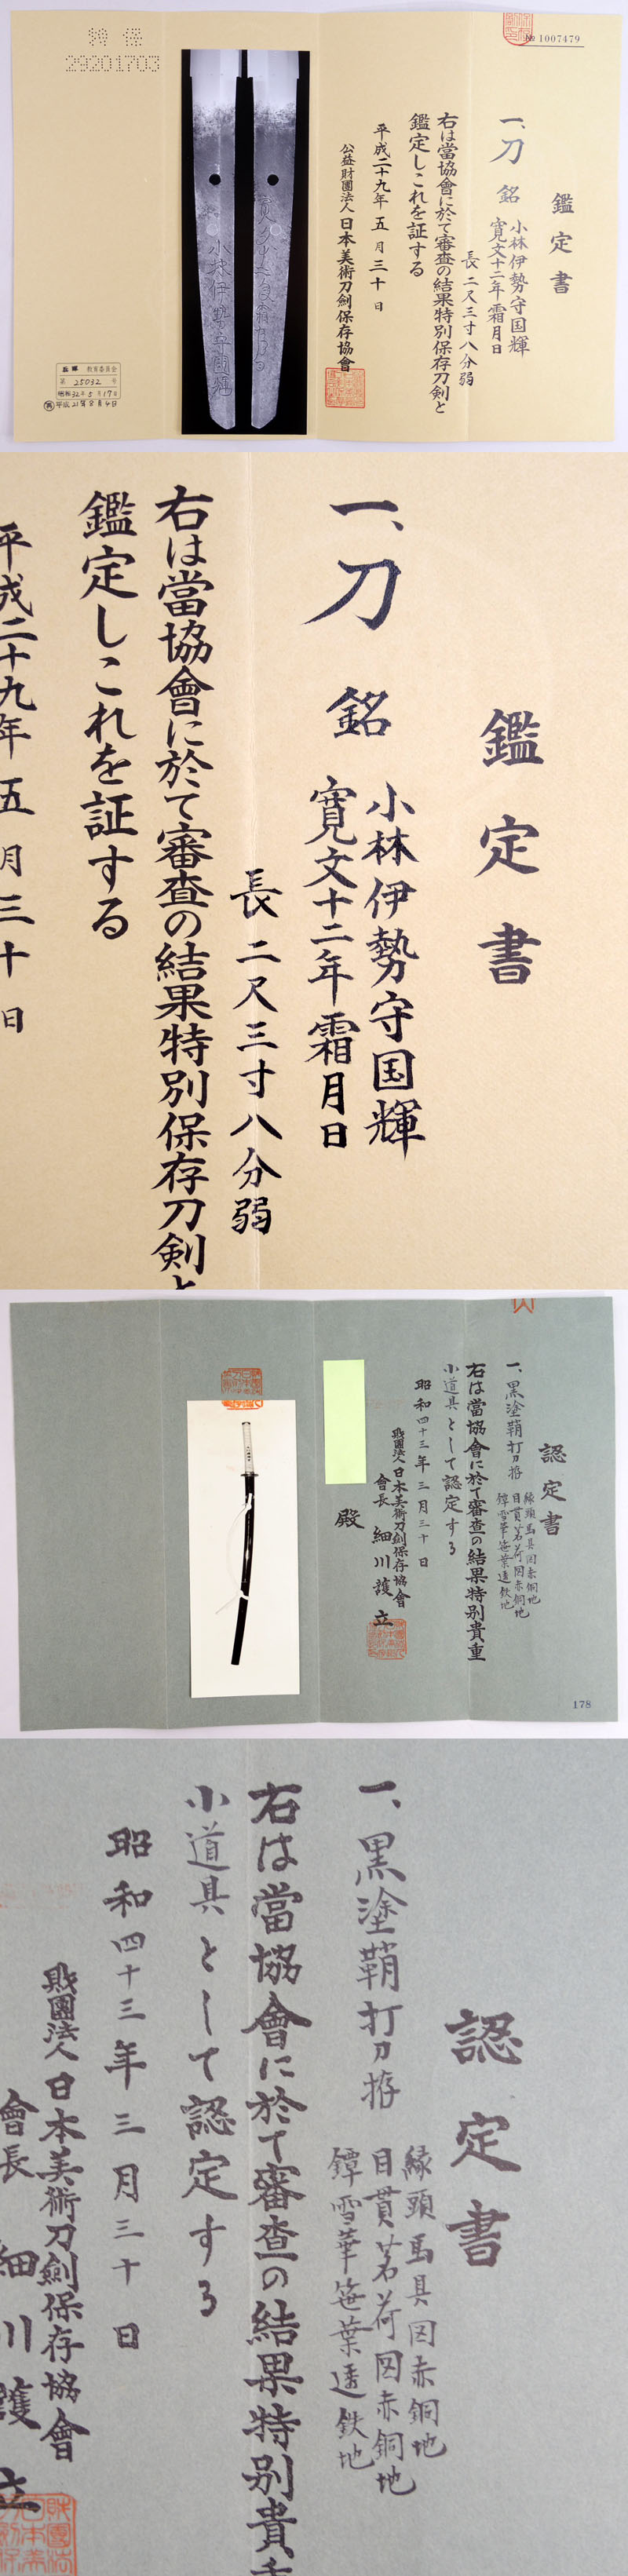 小林伊勢守国輝 Picture of Certificate